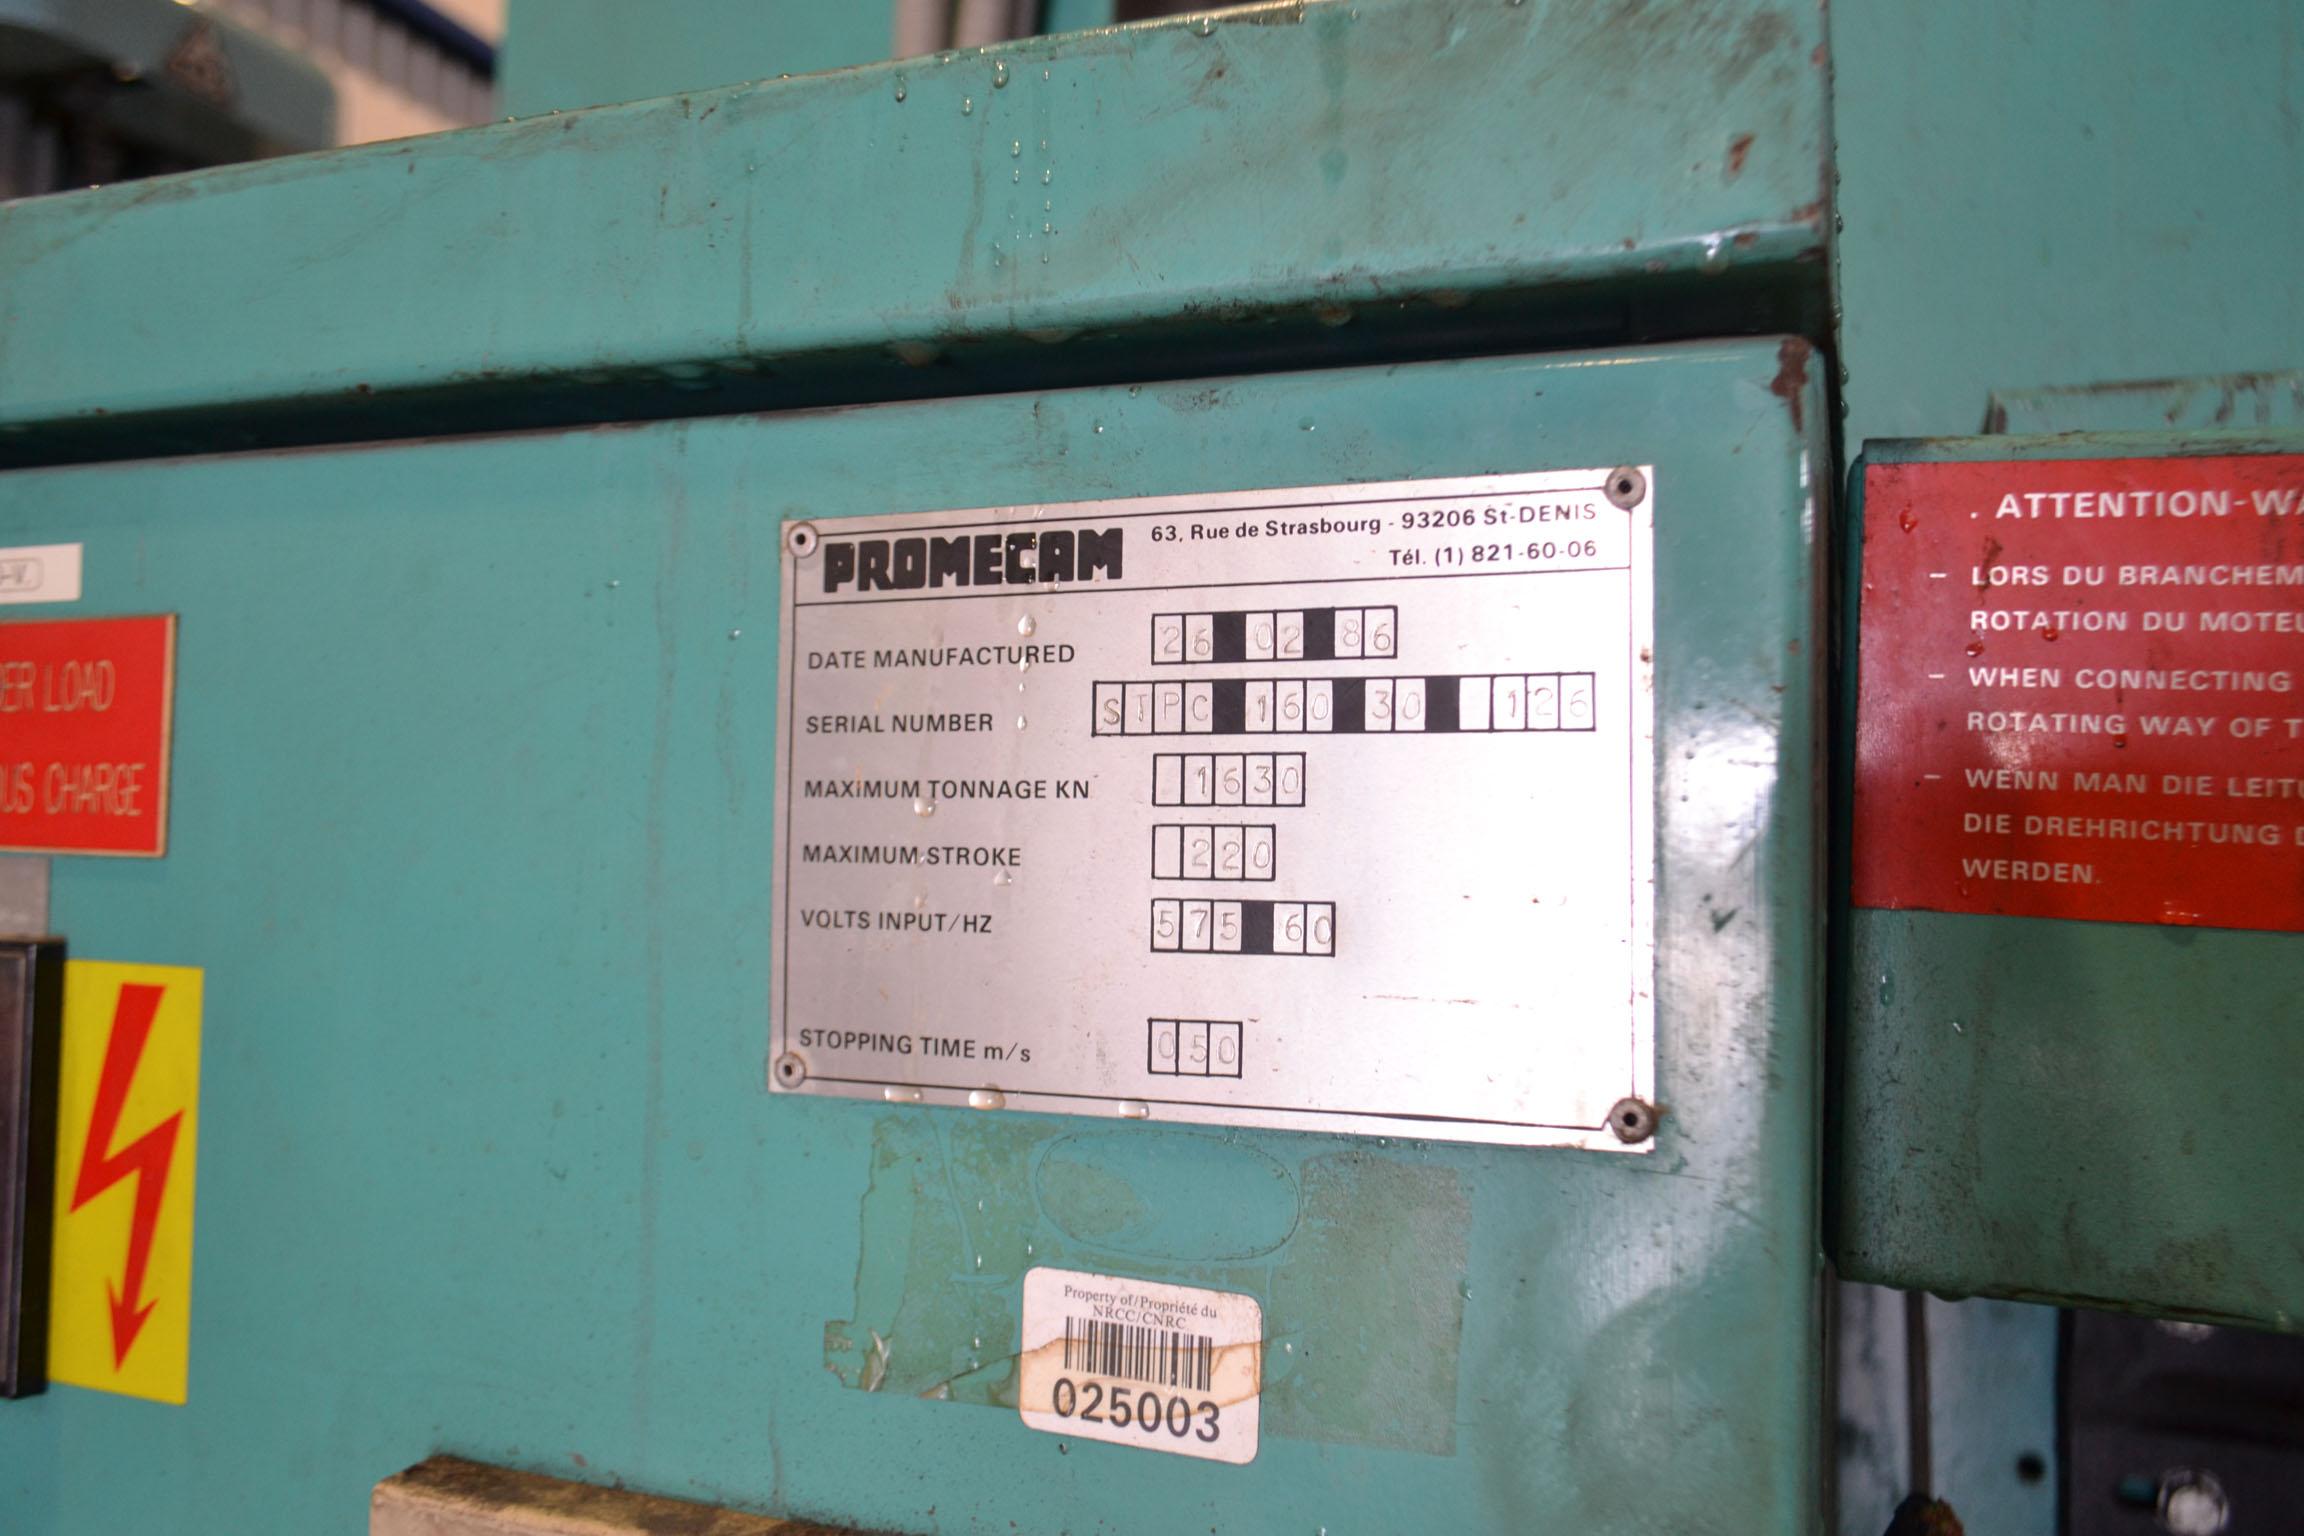 Lot 6 - PROMECAM 10' X 176 TON CNC PRESS BRAKE MOD. STPC1630126, 4-AXIS, 575 VOLTS, ** ELECTRICAL ISSUE** (